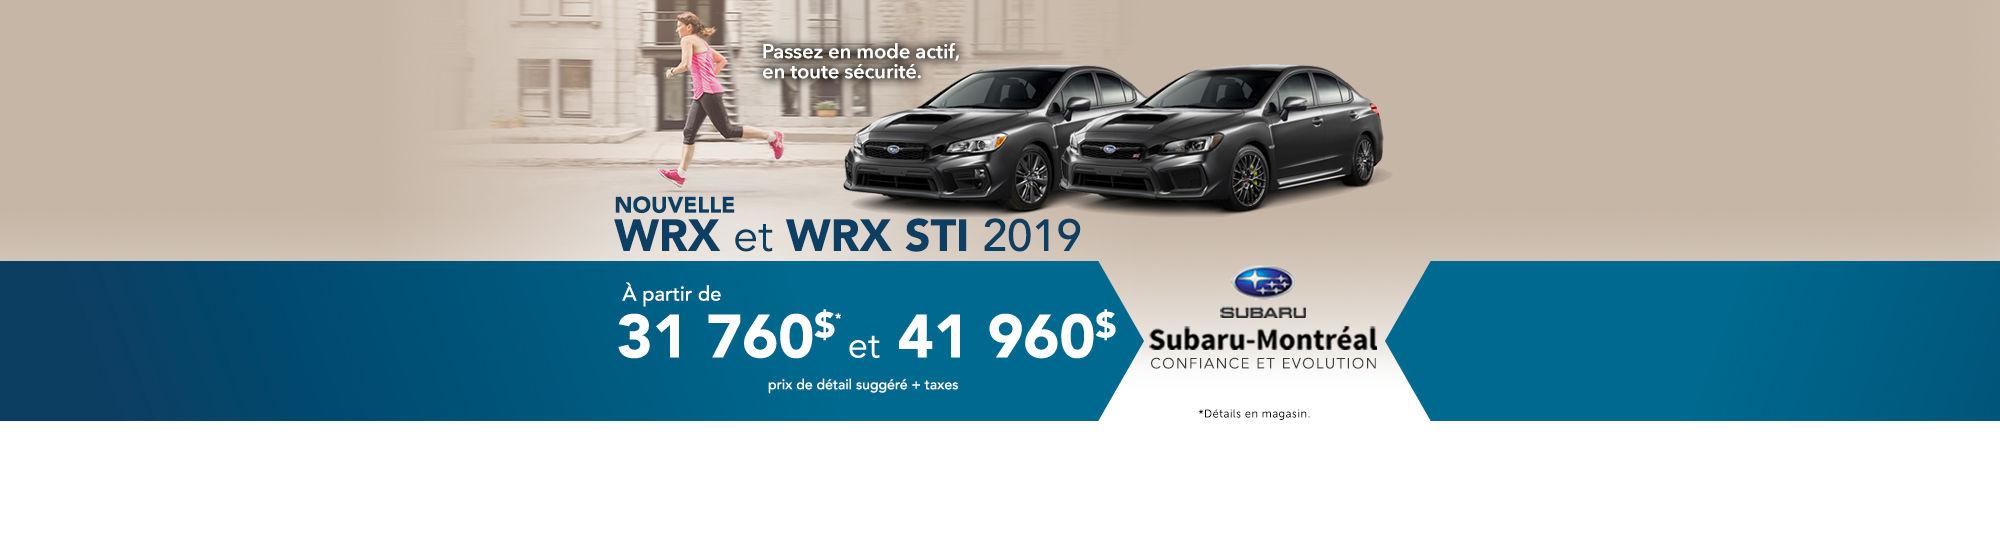 wrx 2019